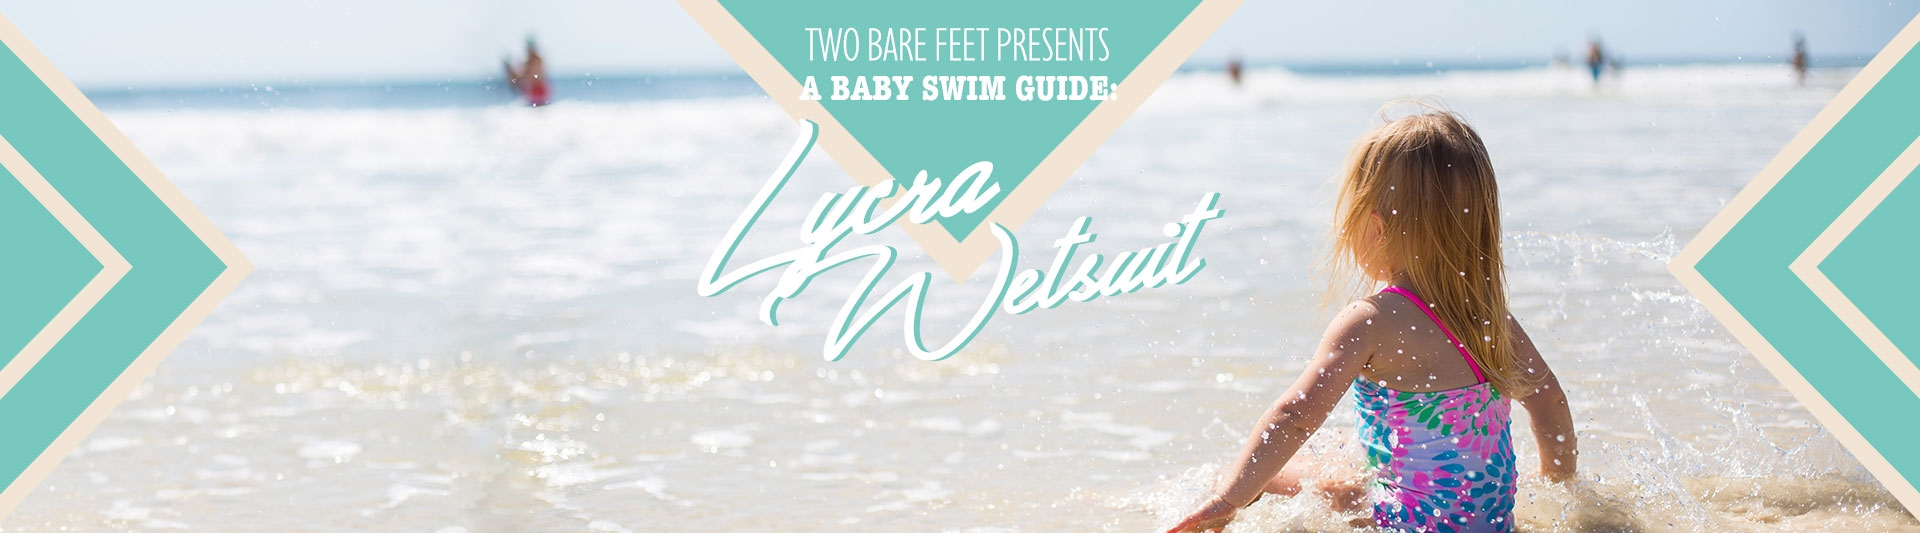 Lycra baby wetsuit banner